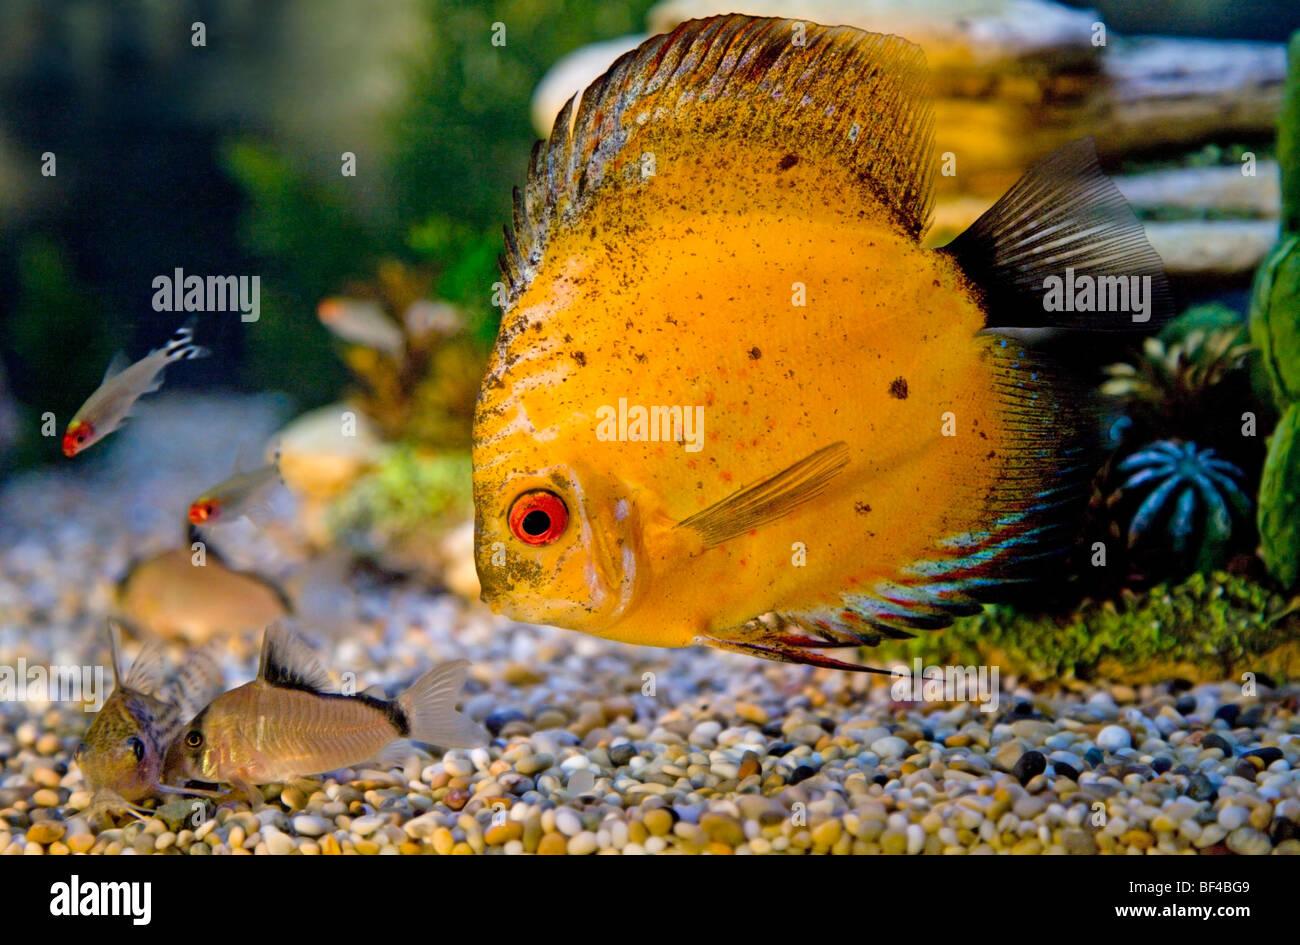 Freshwater aquarium fish cape town - Yellow Discus Fish And Corydora Catfish Stock Image